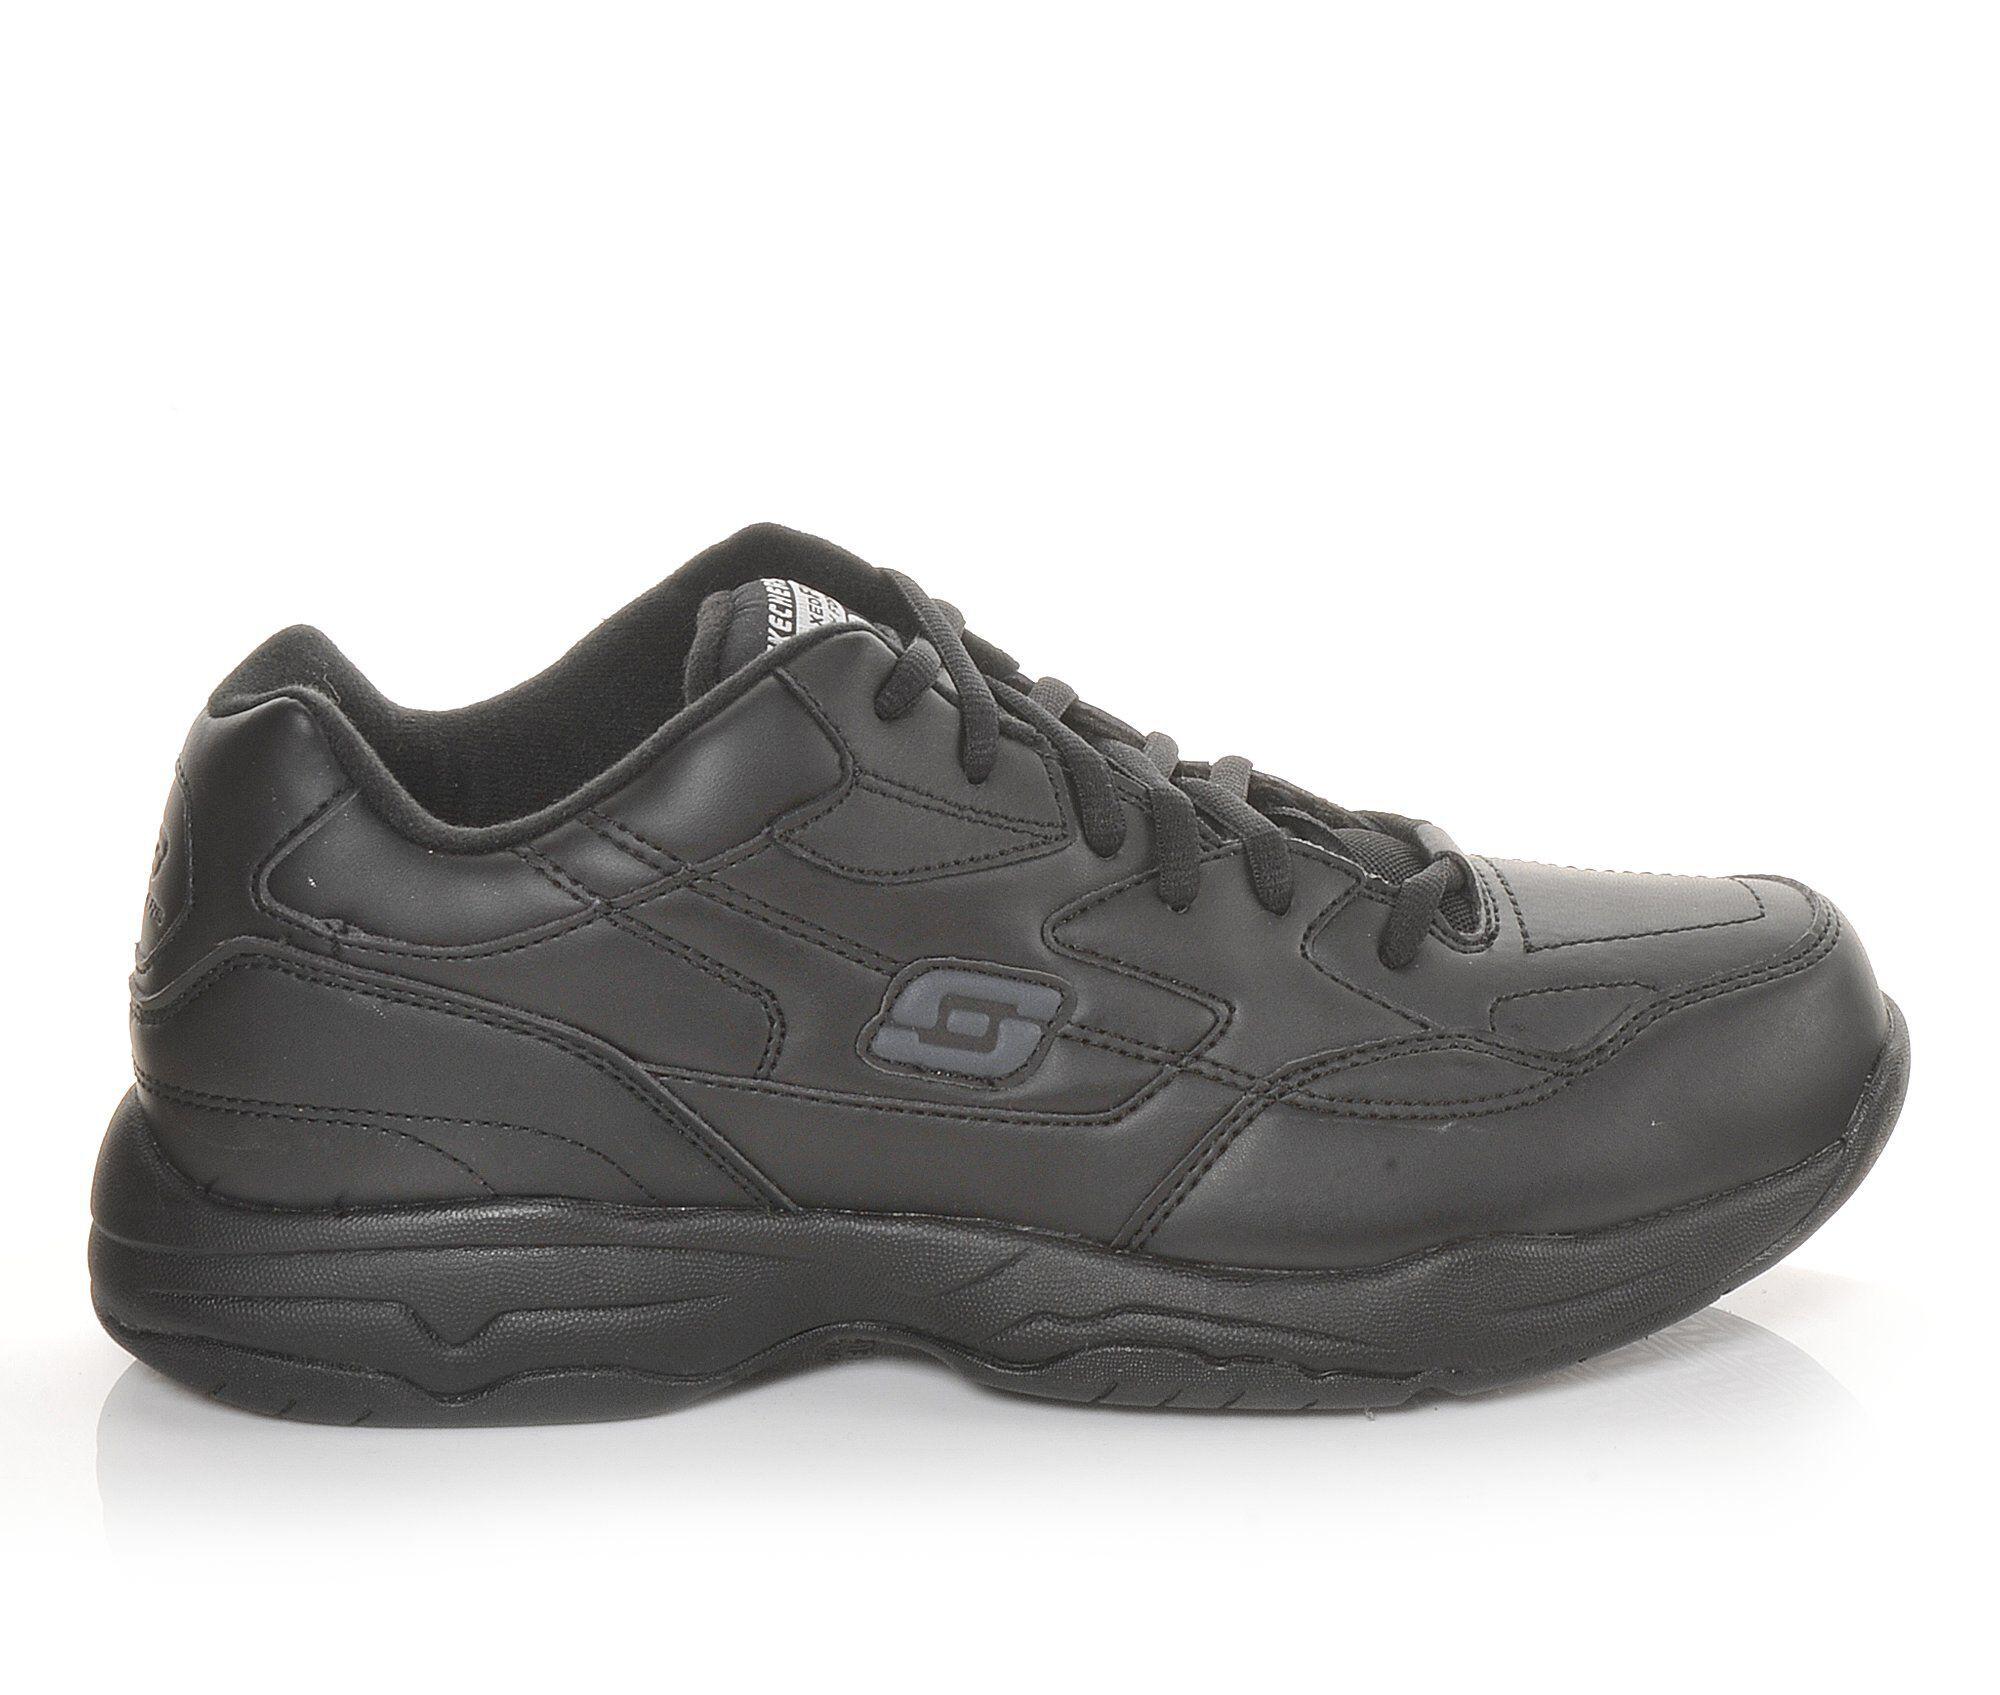 Skechers Shoes Slip Felton Men s Work 77032 Safety Shoe Resistant 0xdqxBSgw a6f159d767f